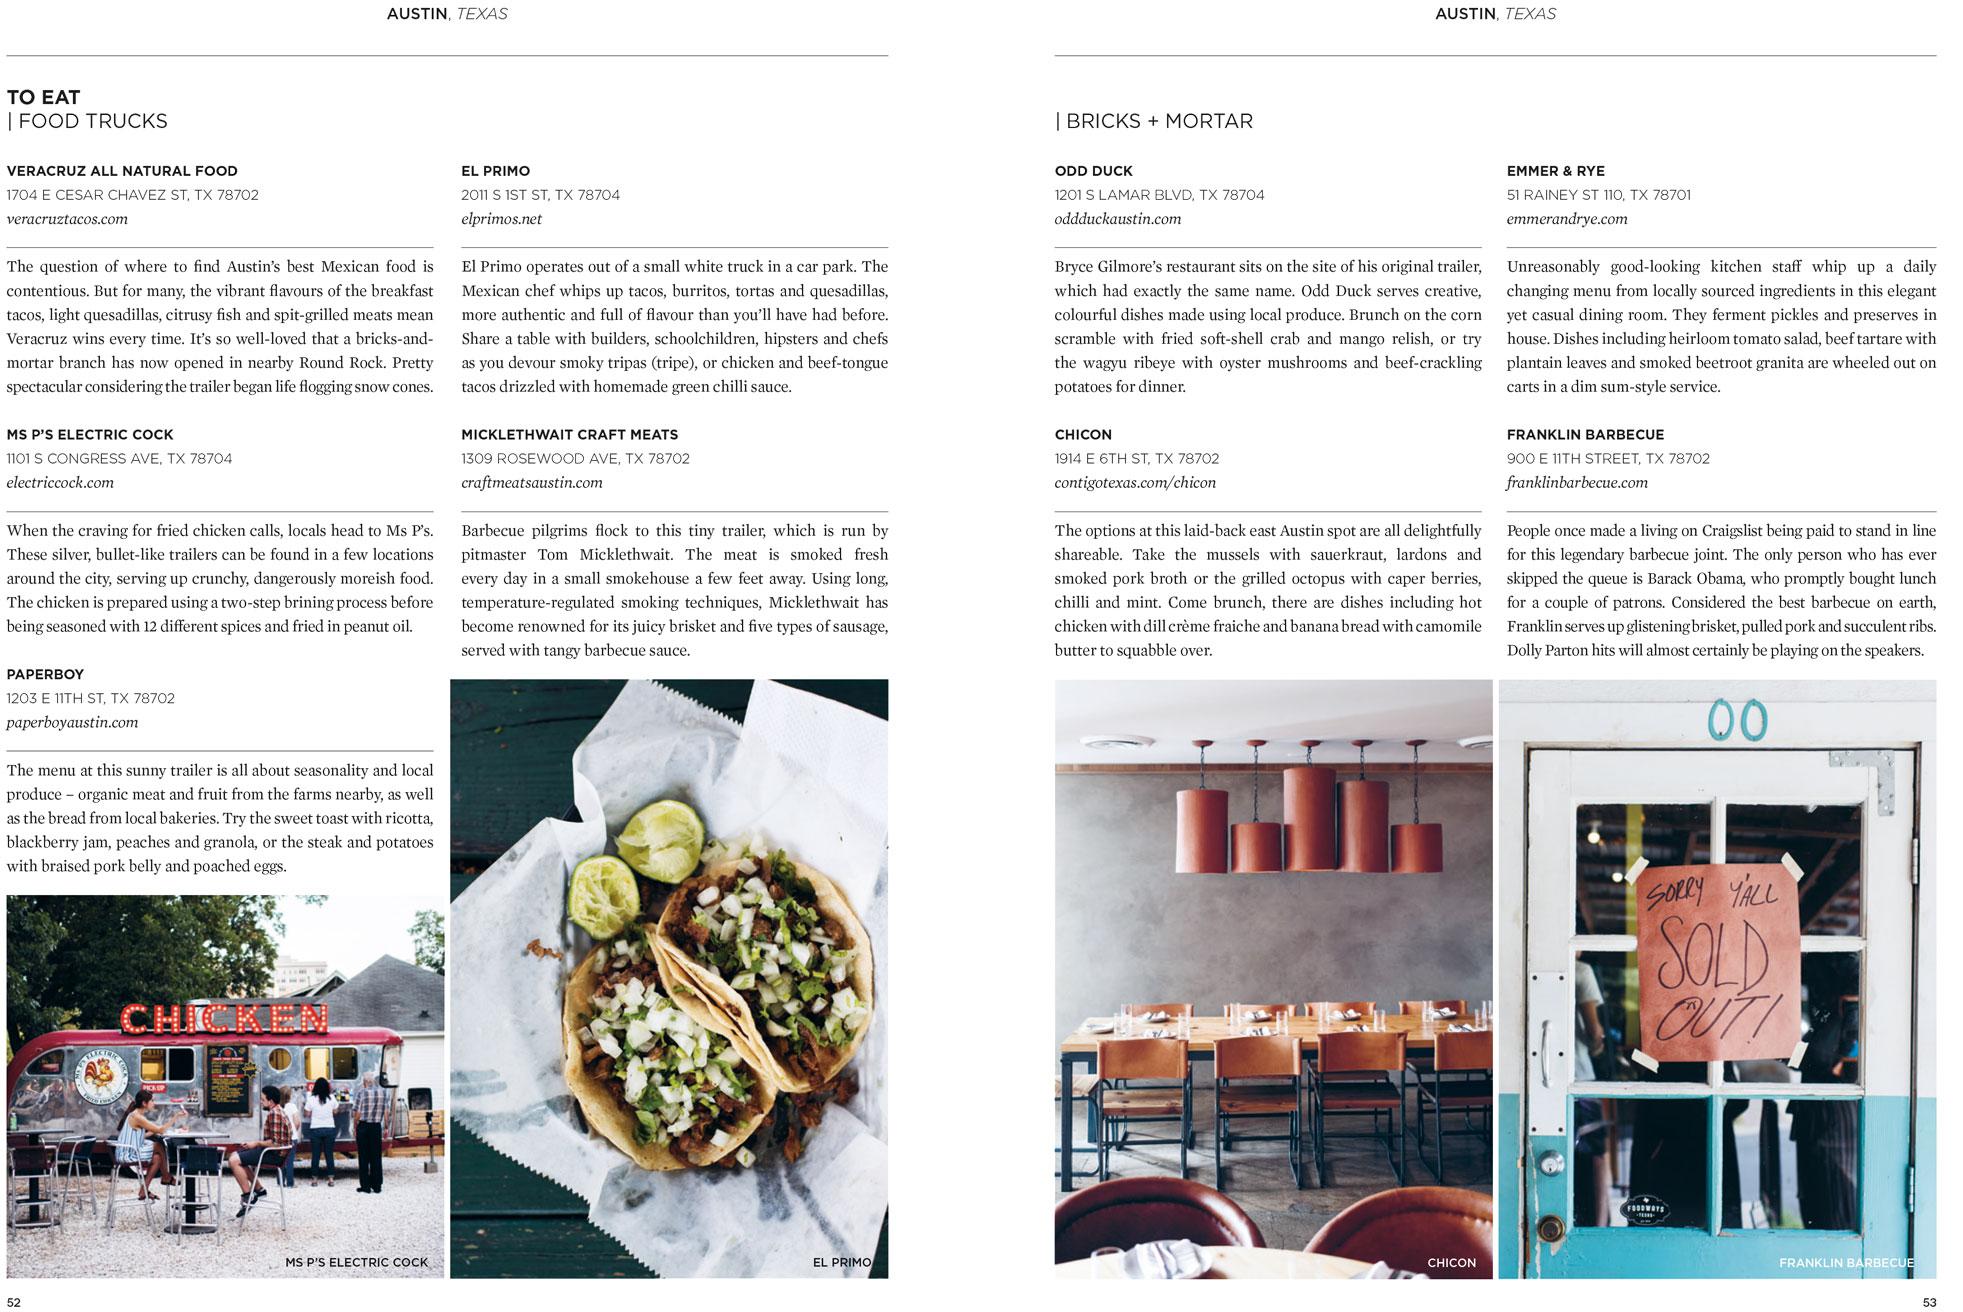 SUITCASE-Vol.16-Austin-Guide-2.jpg